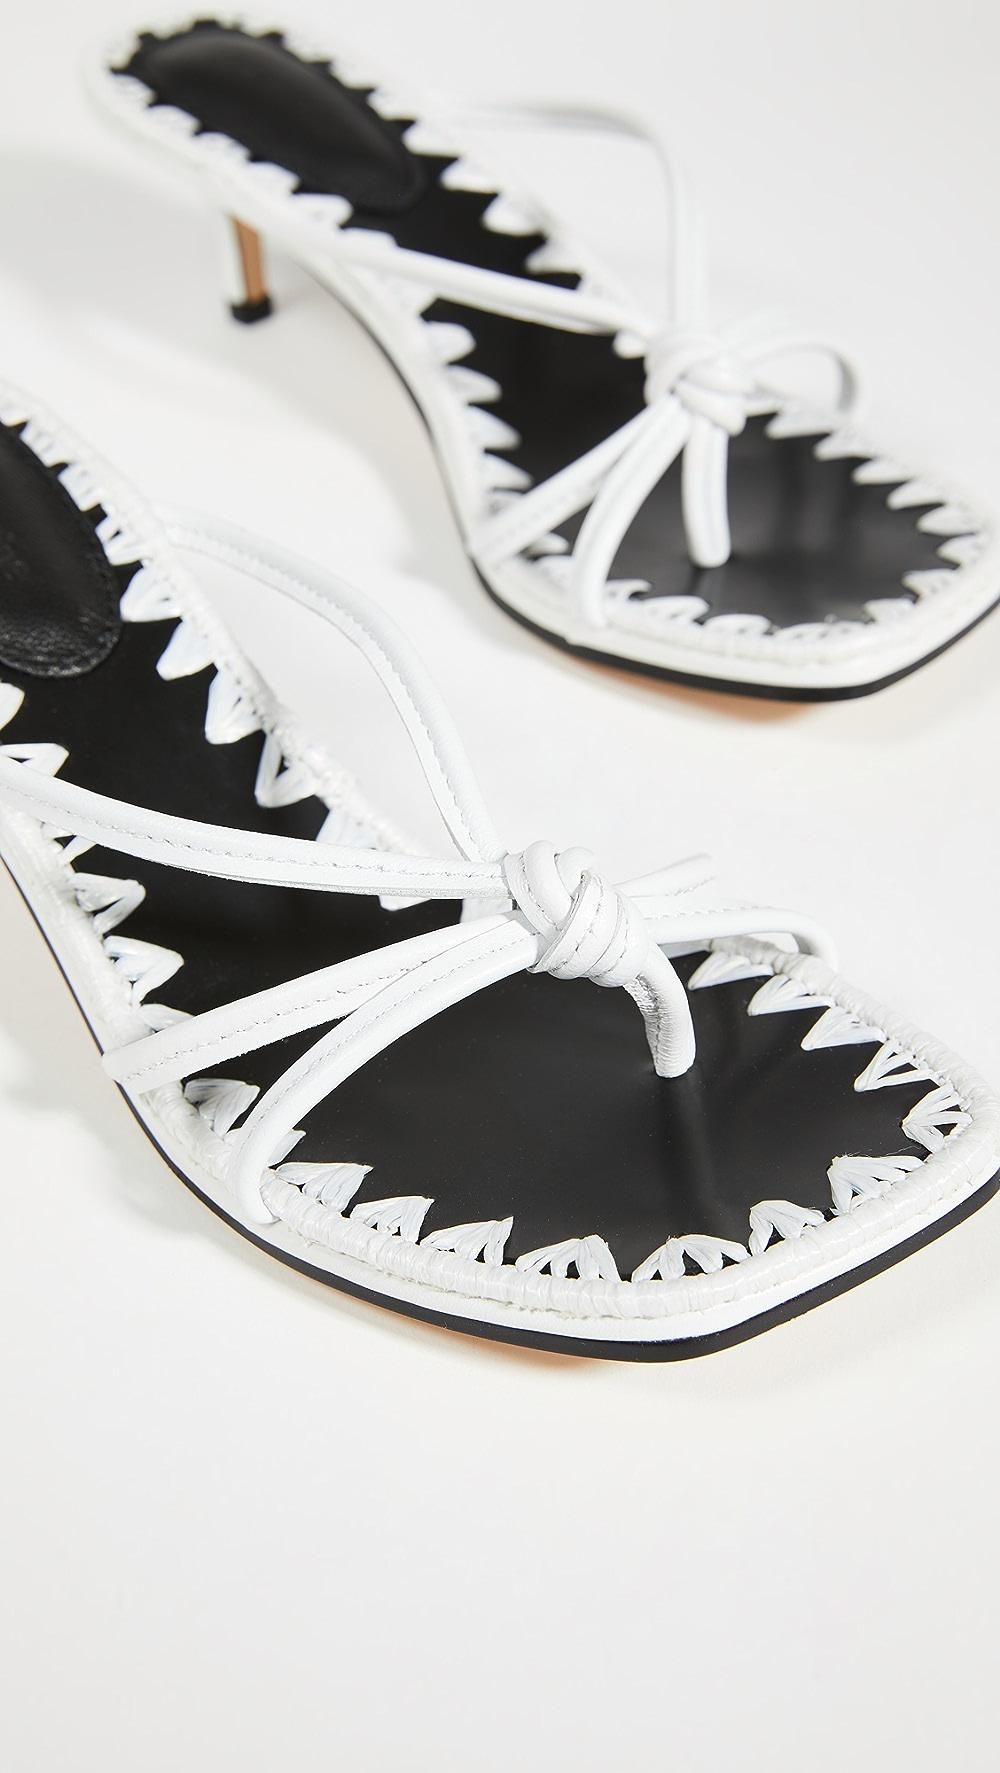 Hospitable Mara & Mine - Azeline Kitten Heel Sandals Sufficient Supply